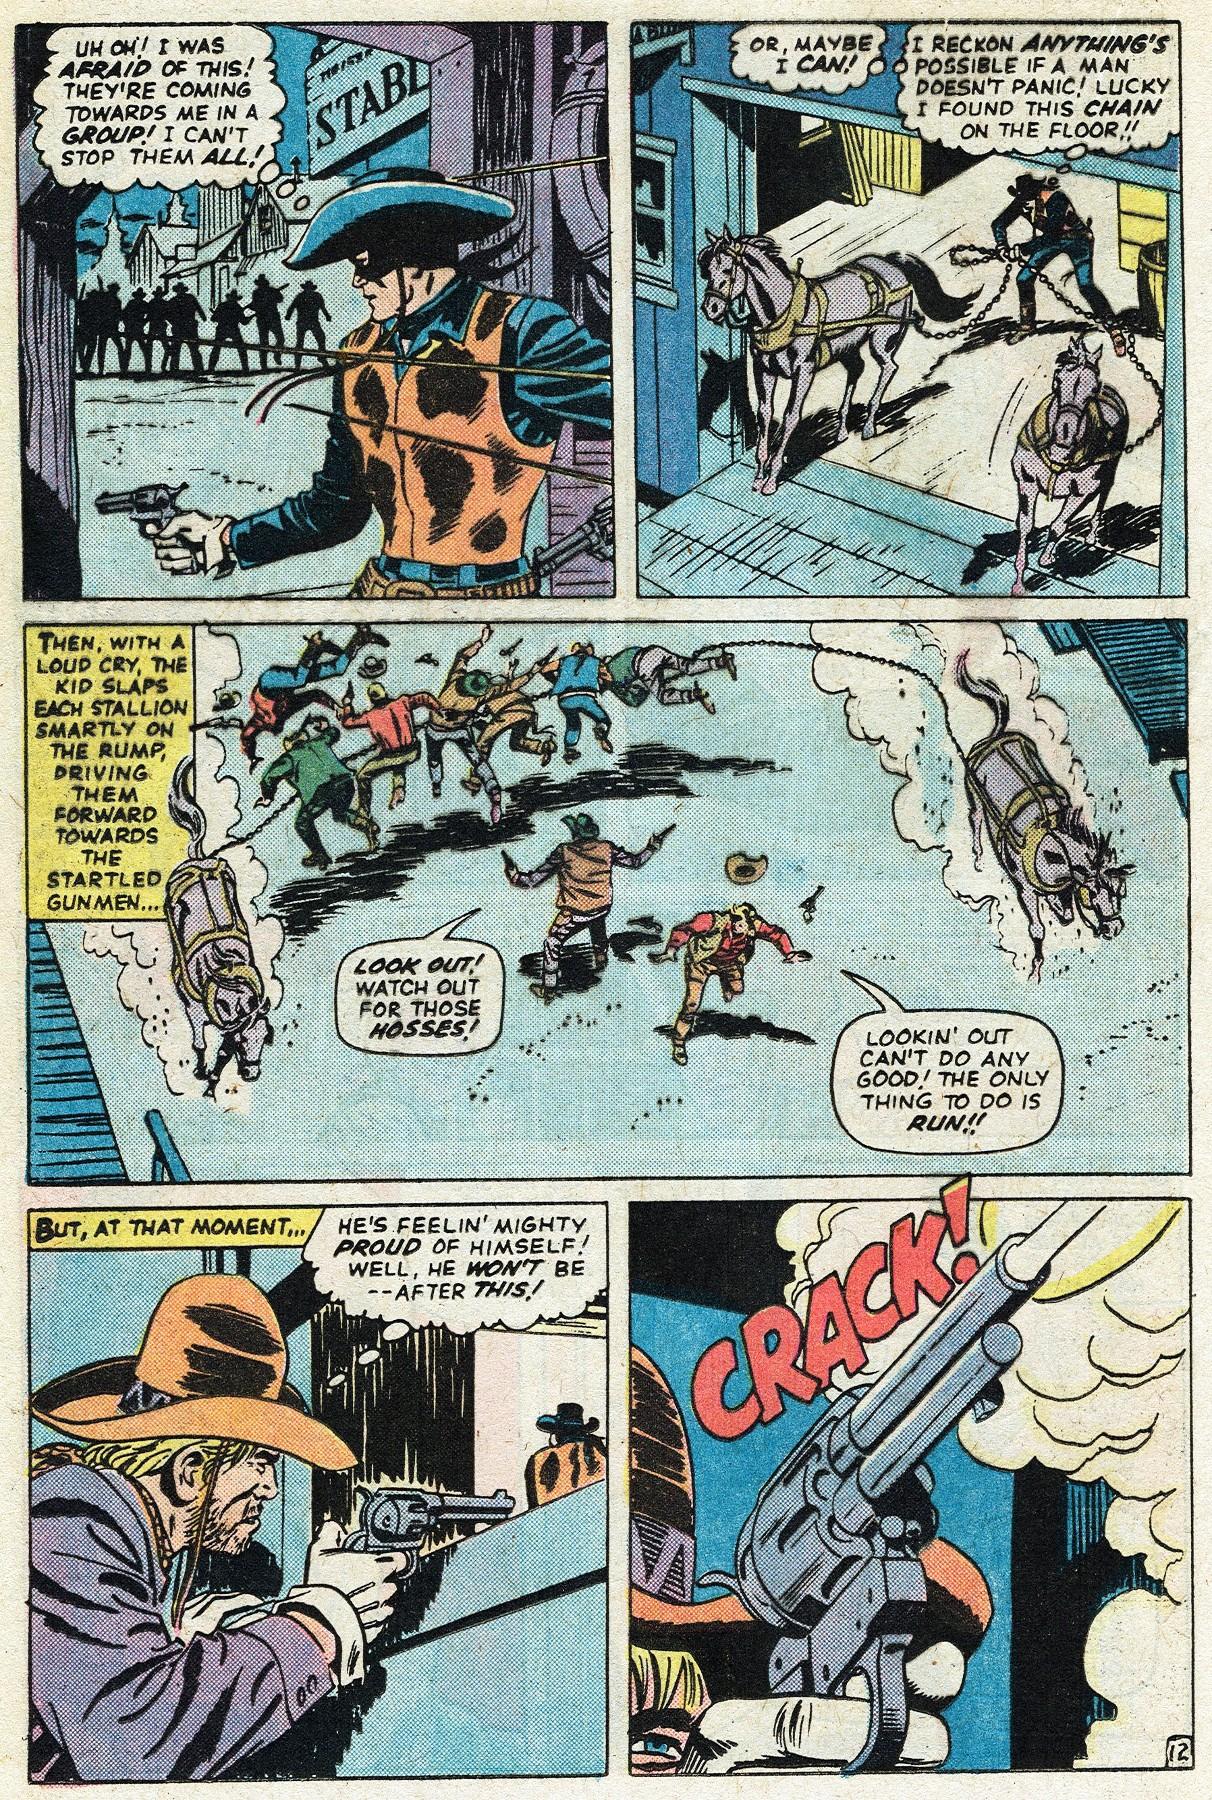 Read online Two-Gun Kid comic -  Issue #122 - 20